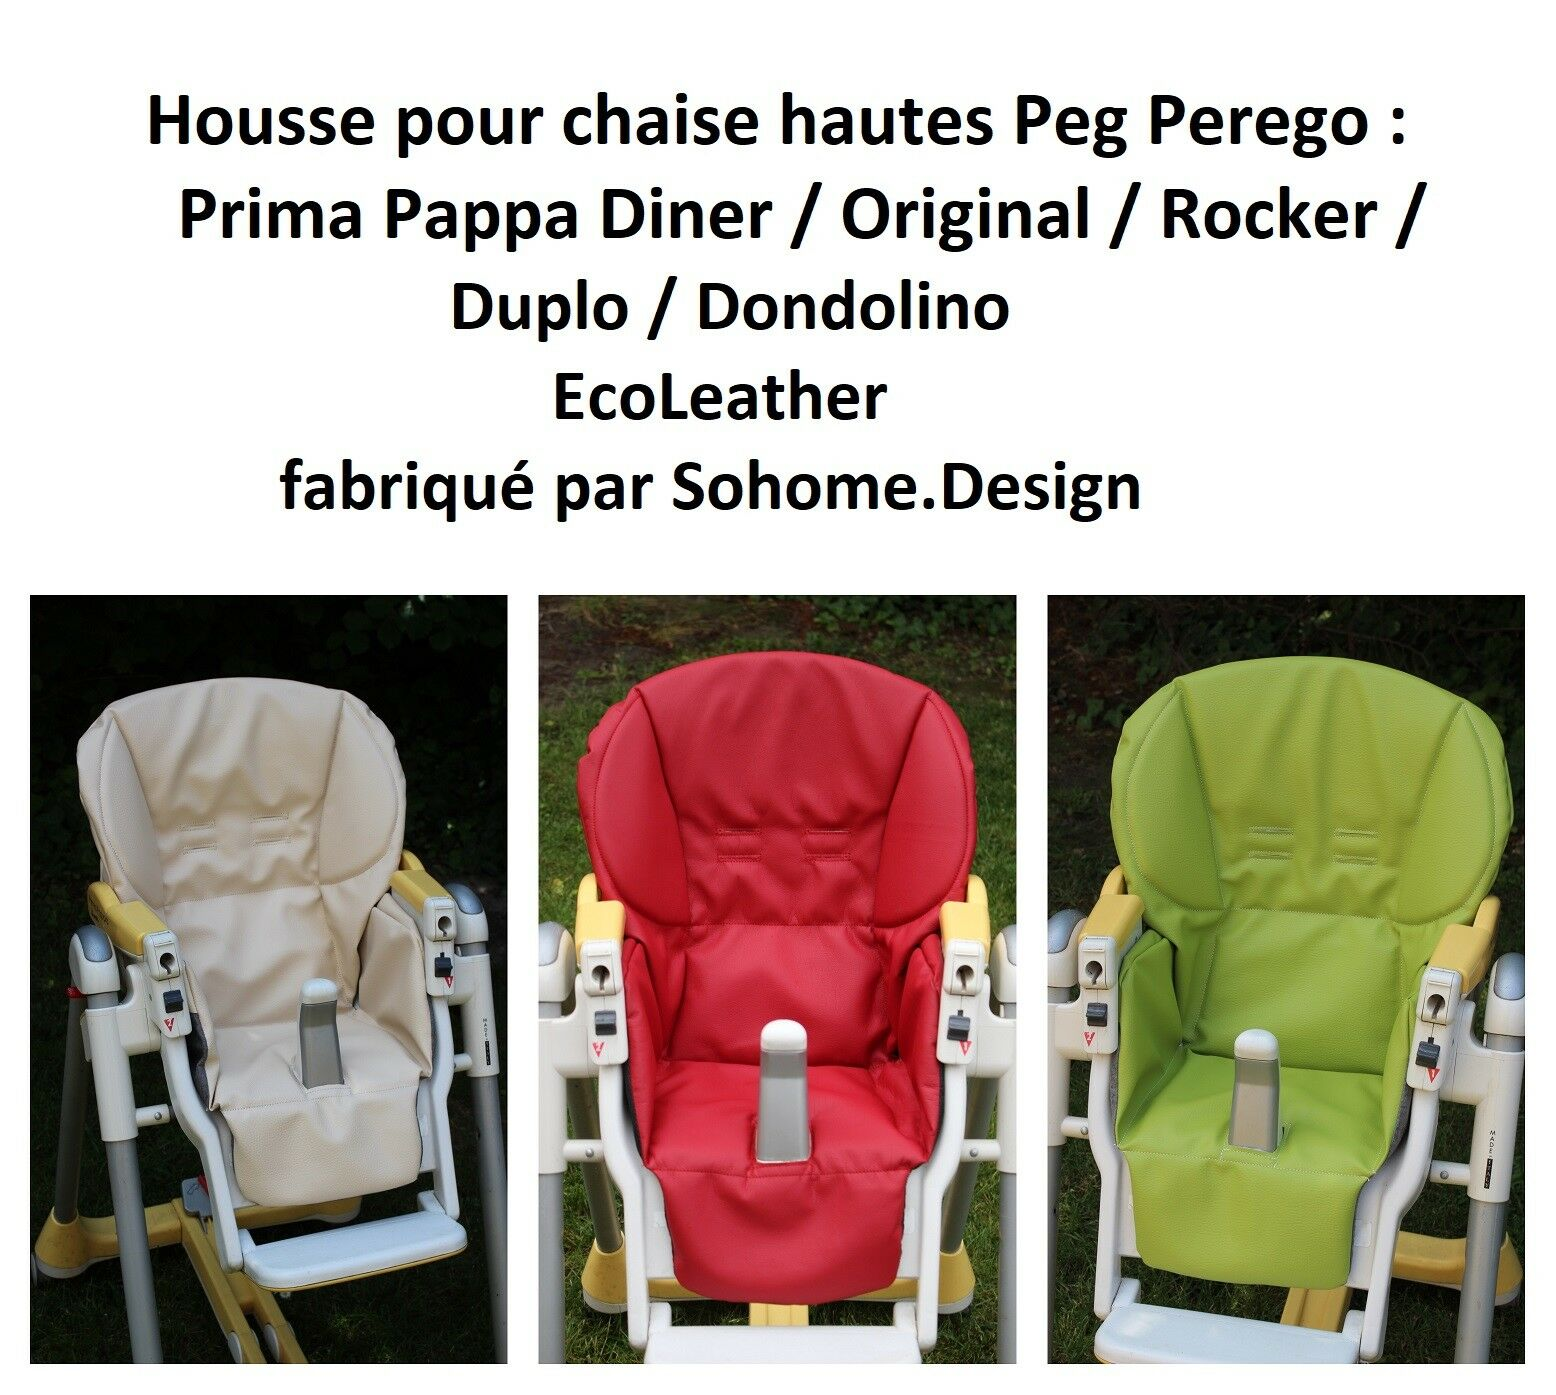 Hautes Rocker Chaise Housse By Peg Pour Sohome design Pappa Diner Perego Prima wOkiTluPXZ